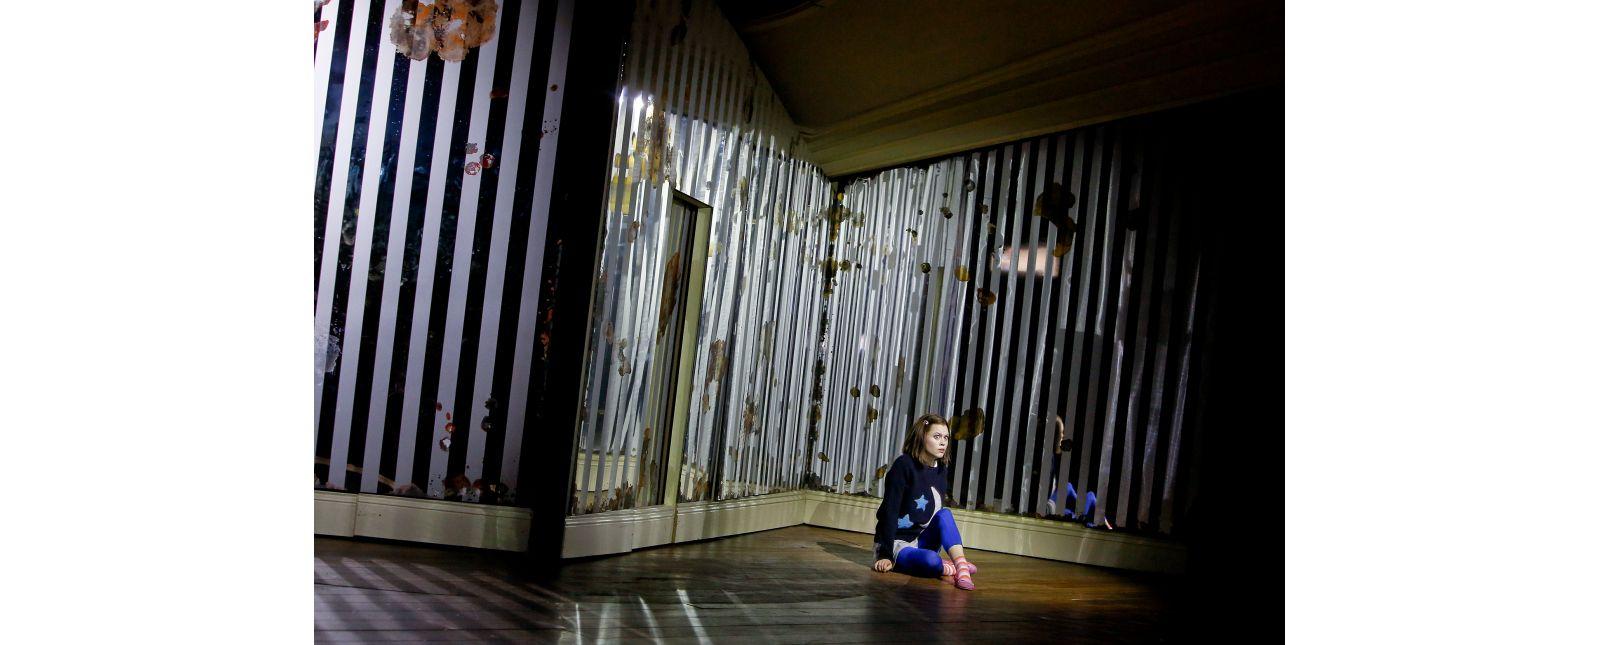 Coraline // Samantha Gaul // 2018 // Birgit Hupfeld